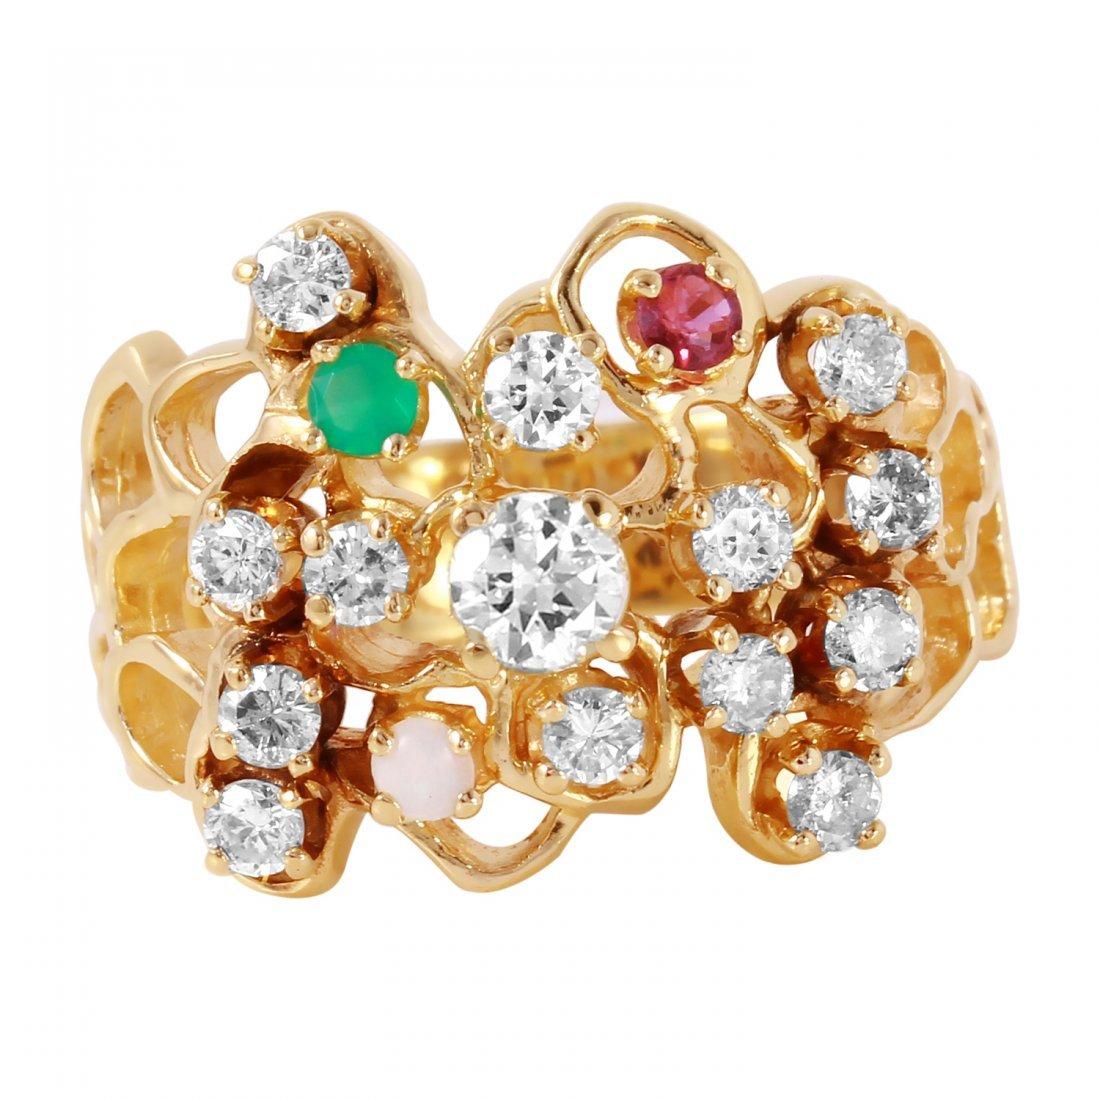 Ladies 1CTW Diamond And Multigem 14K Yellow Gold Ring - 3